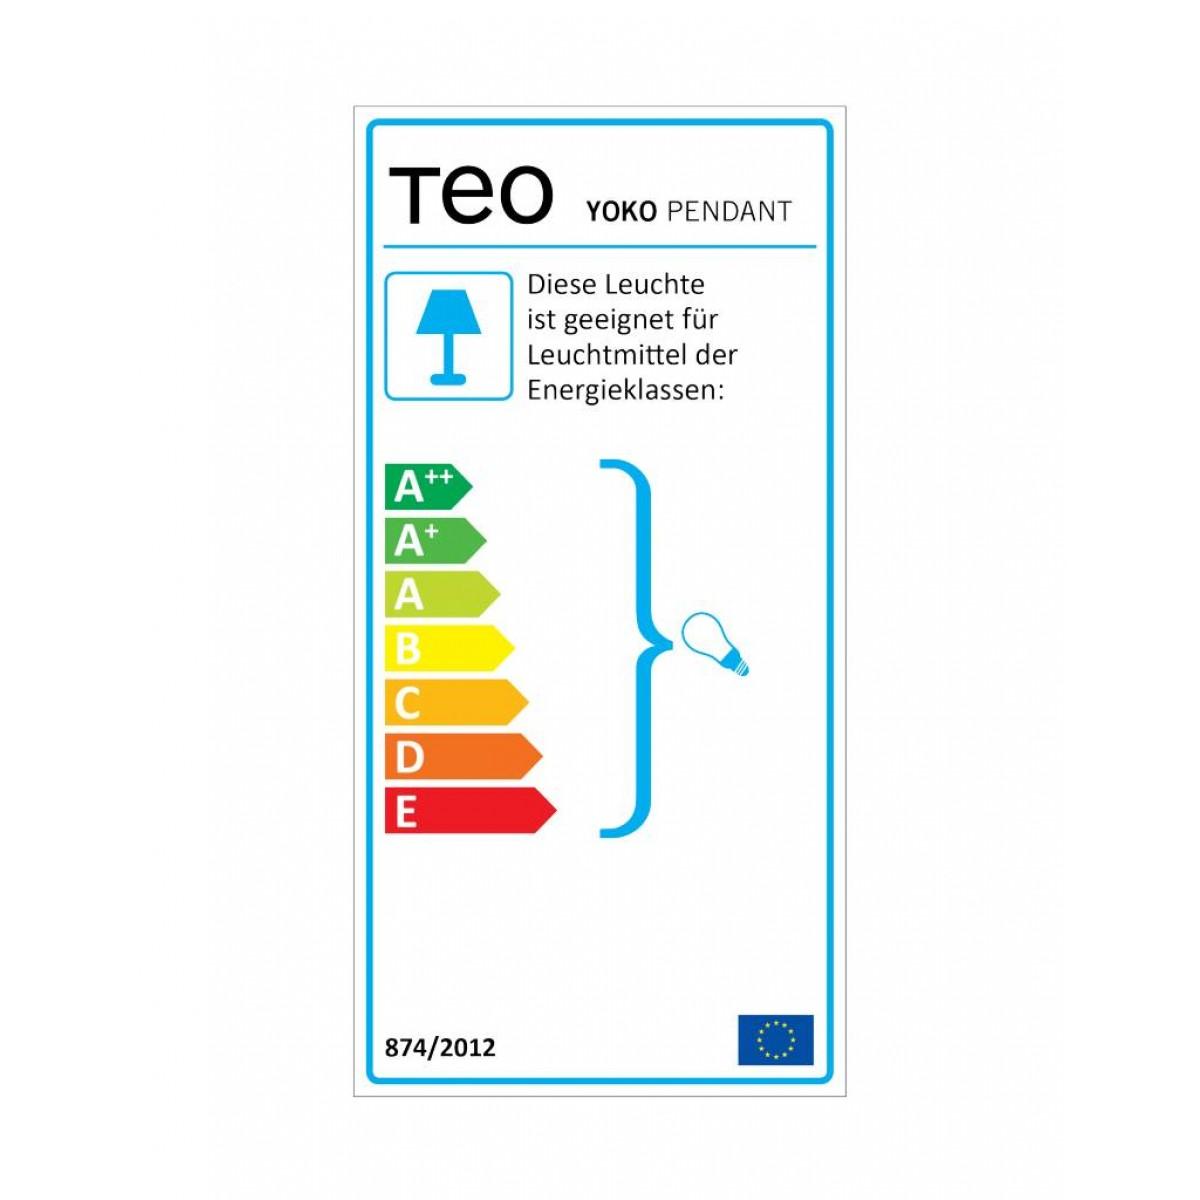 TEO - YOKO - Hängeleuchte (dunkelrot)